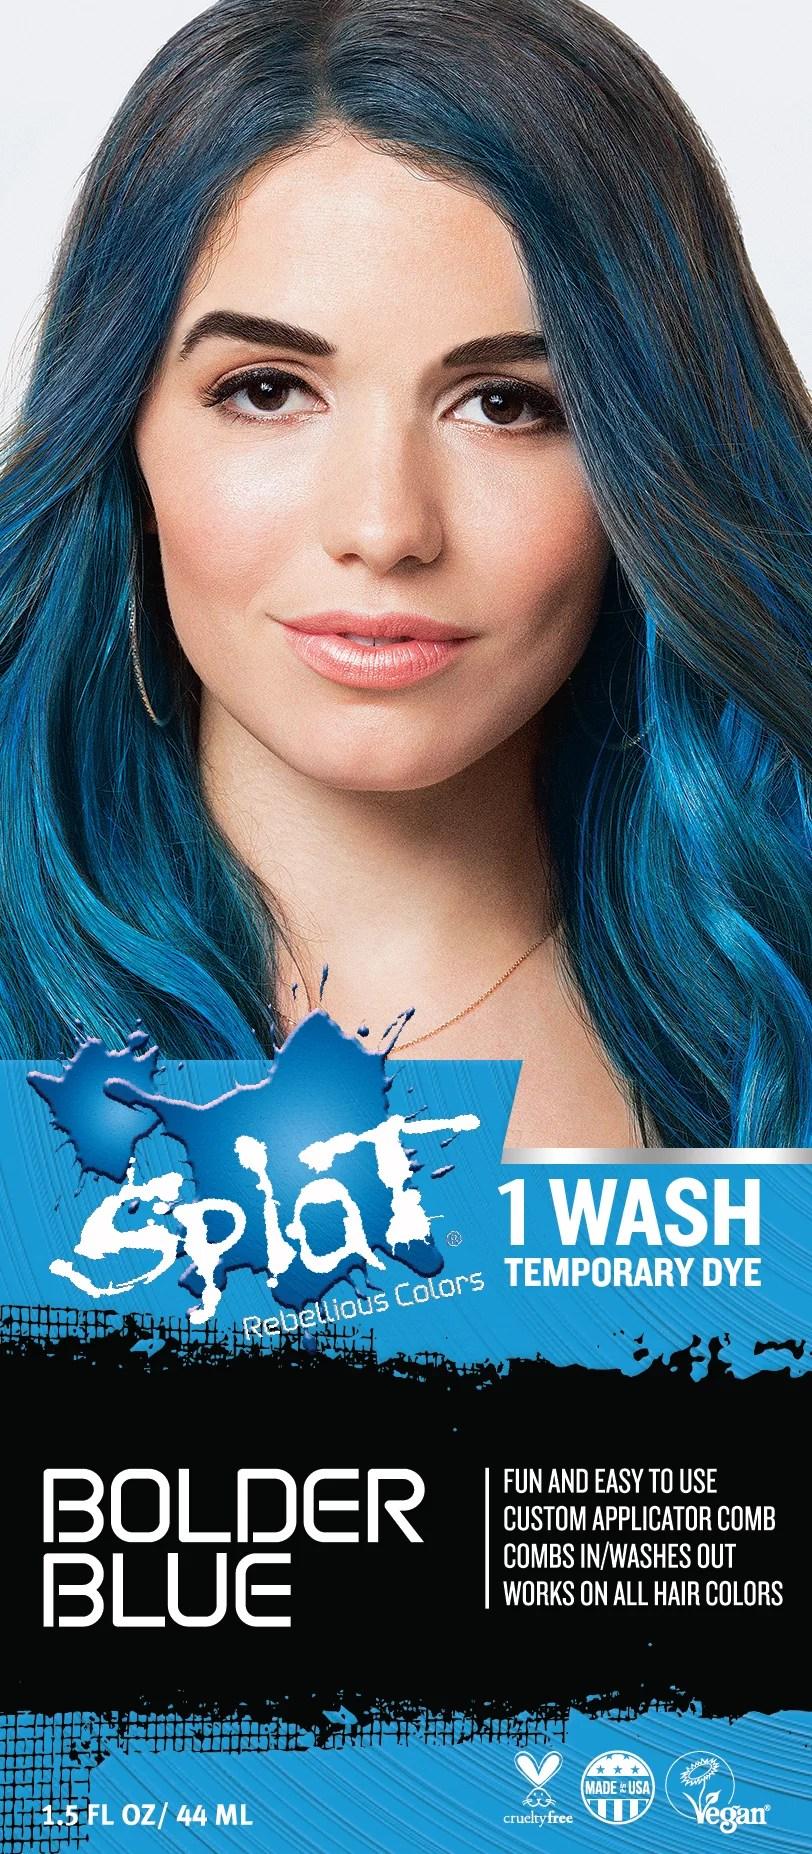 Splat 1 Wash Bolder Blue Hair Color Temporary Bleach Free ...